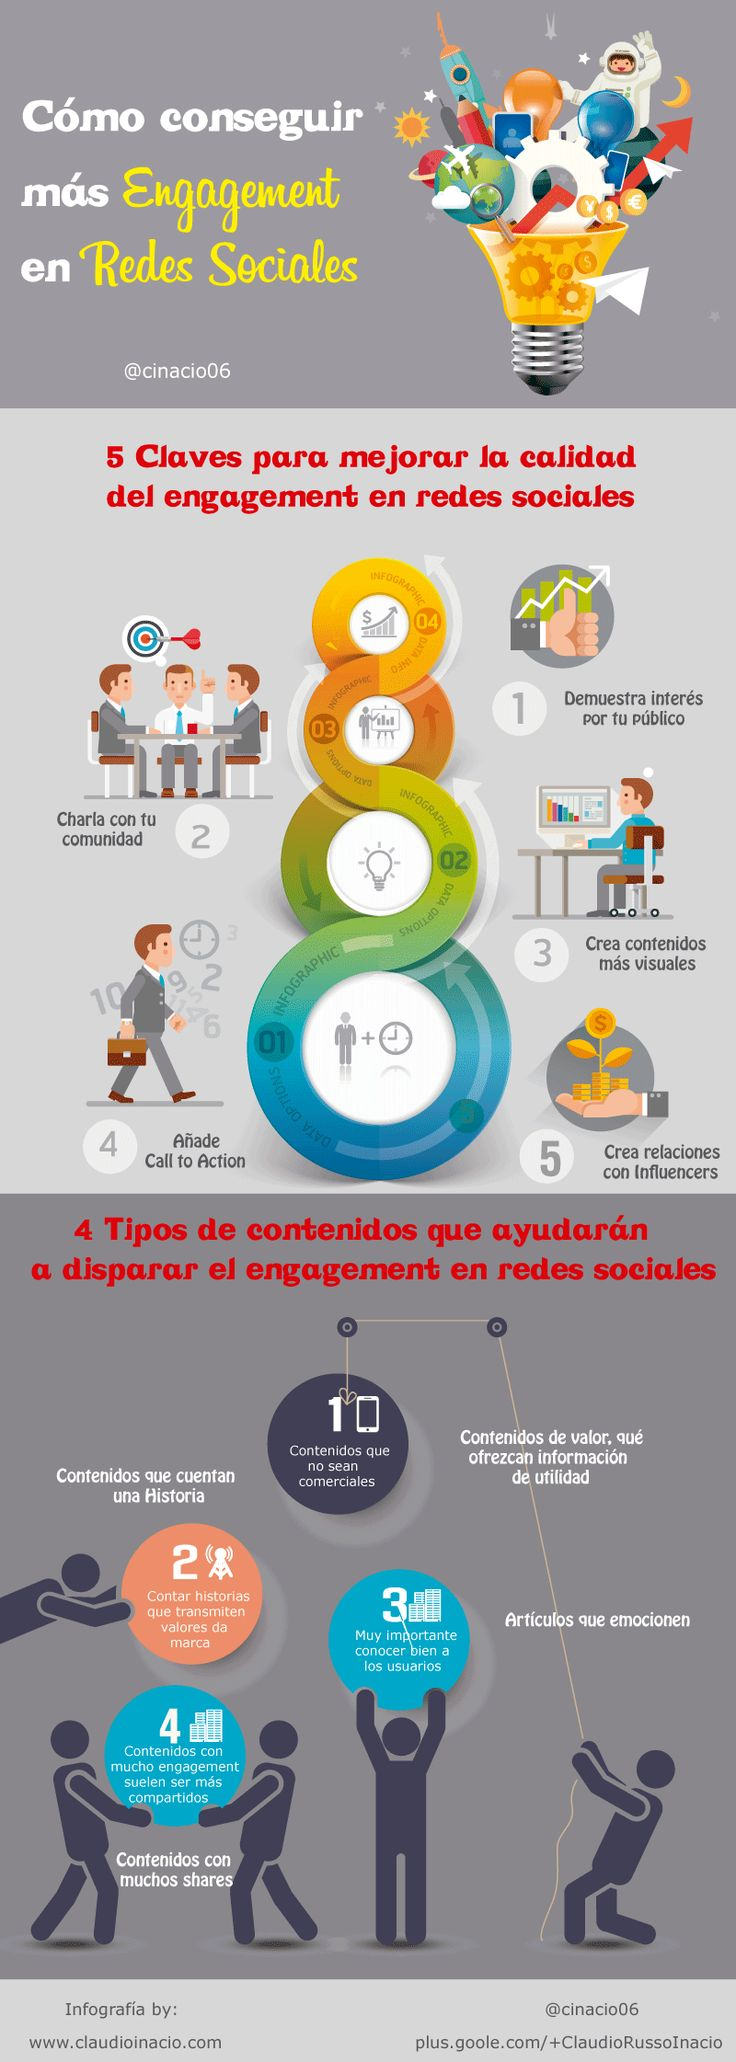 infografia como conseguir más engagement en social media